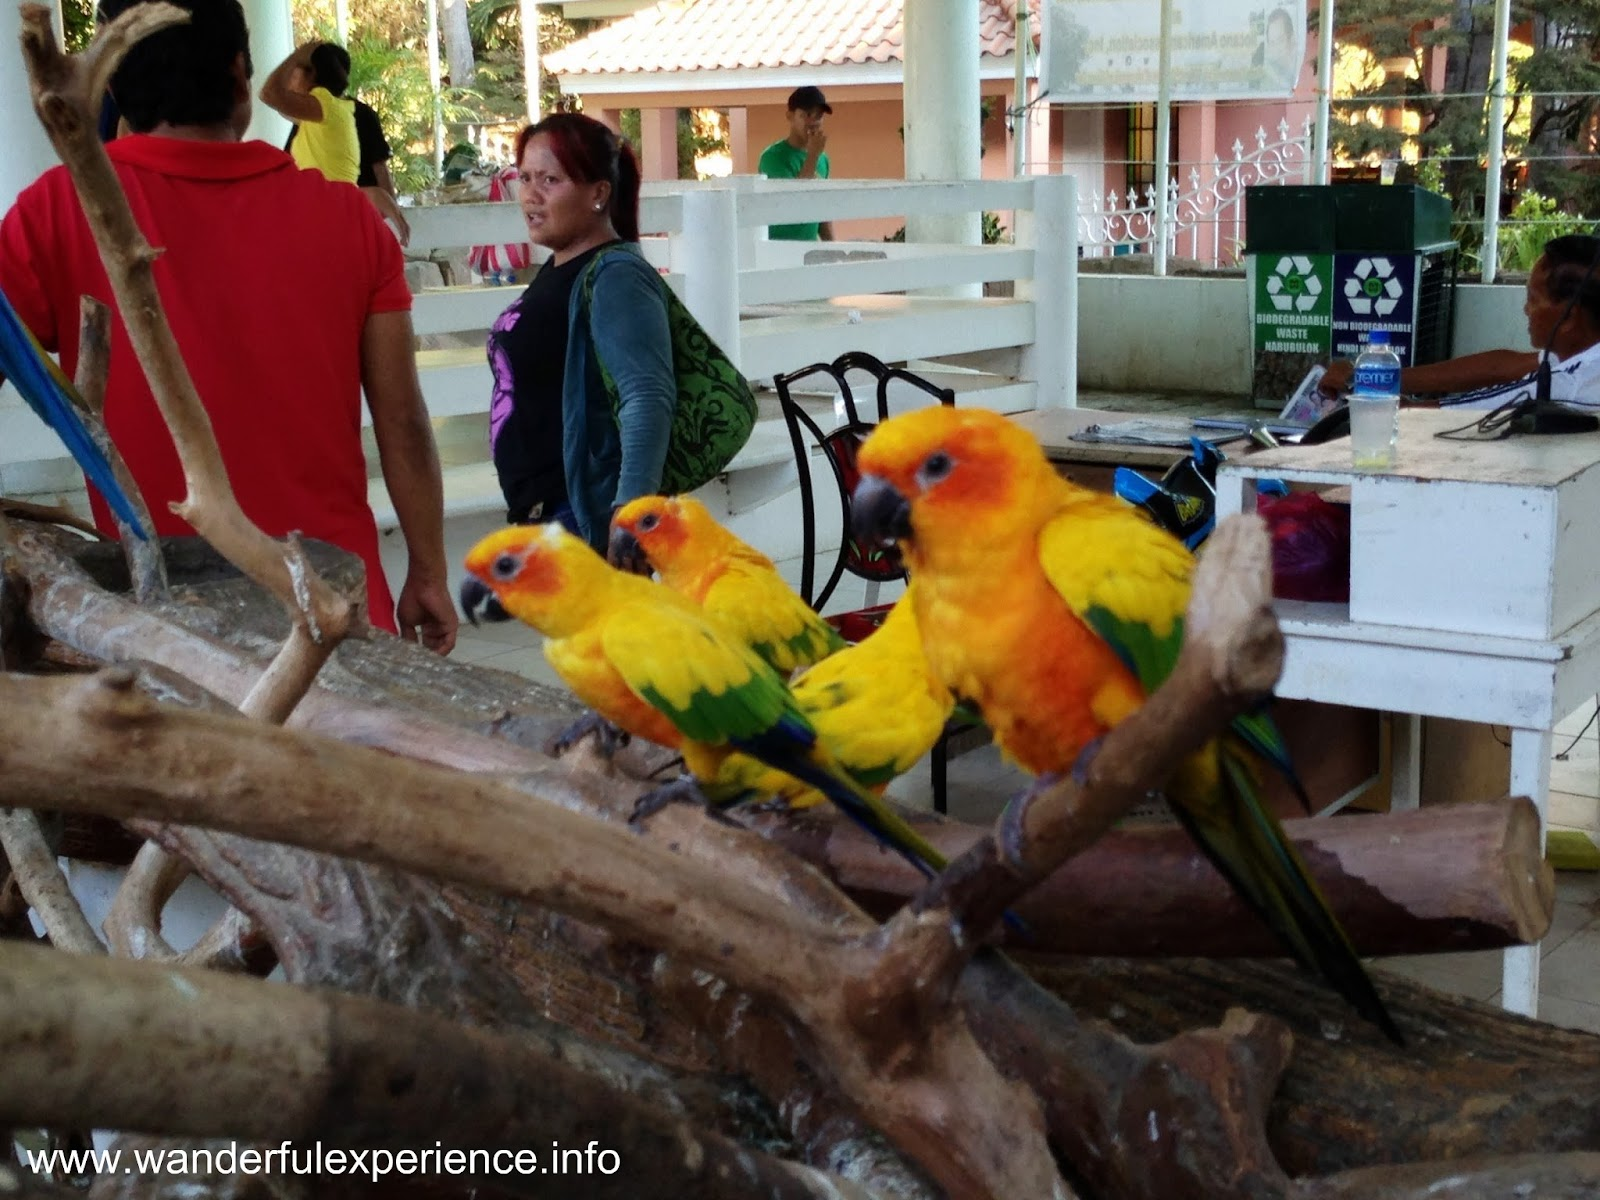 Family of parrot